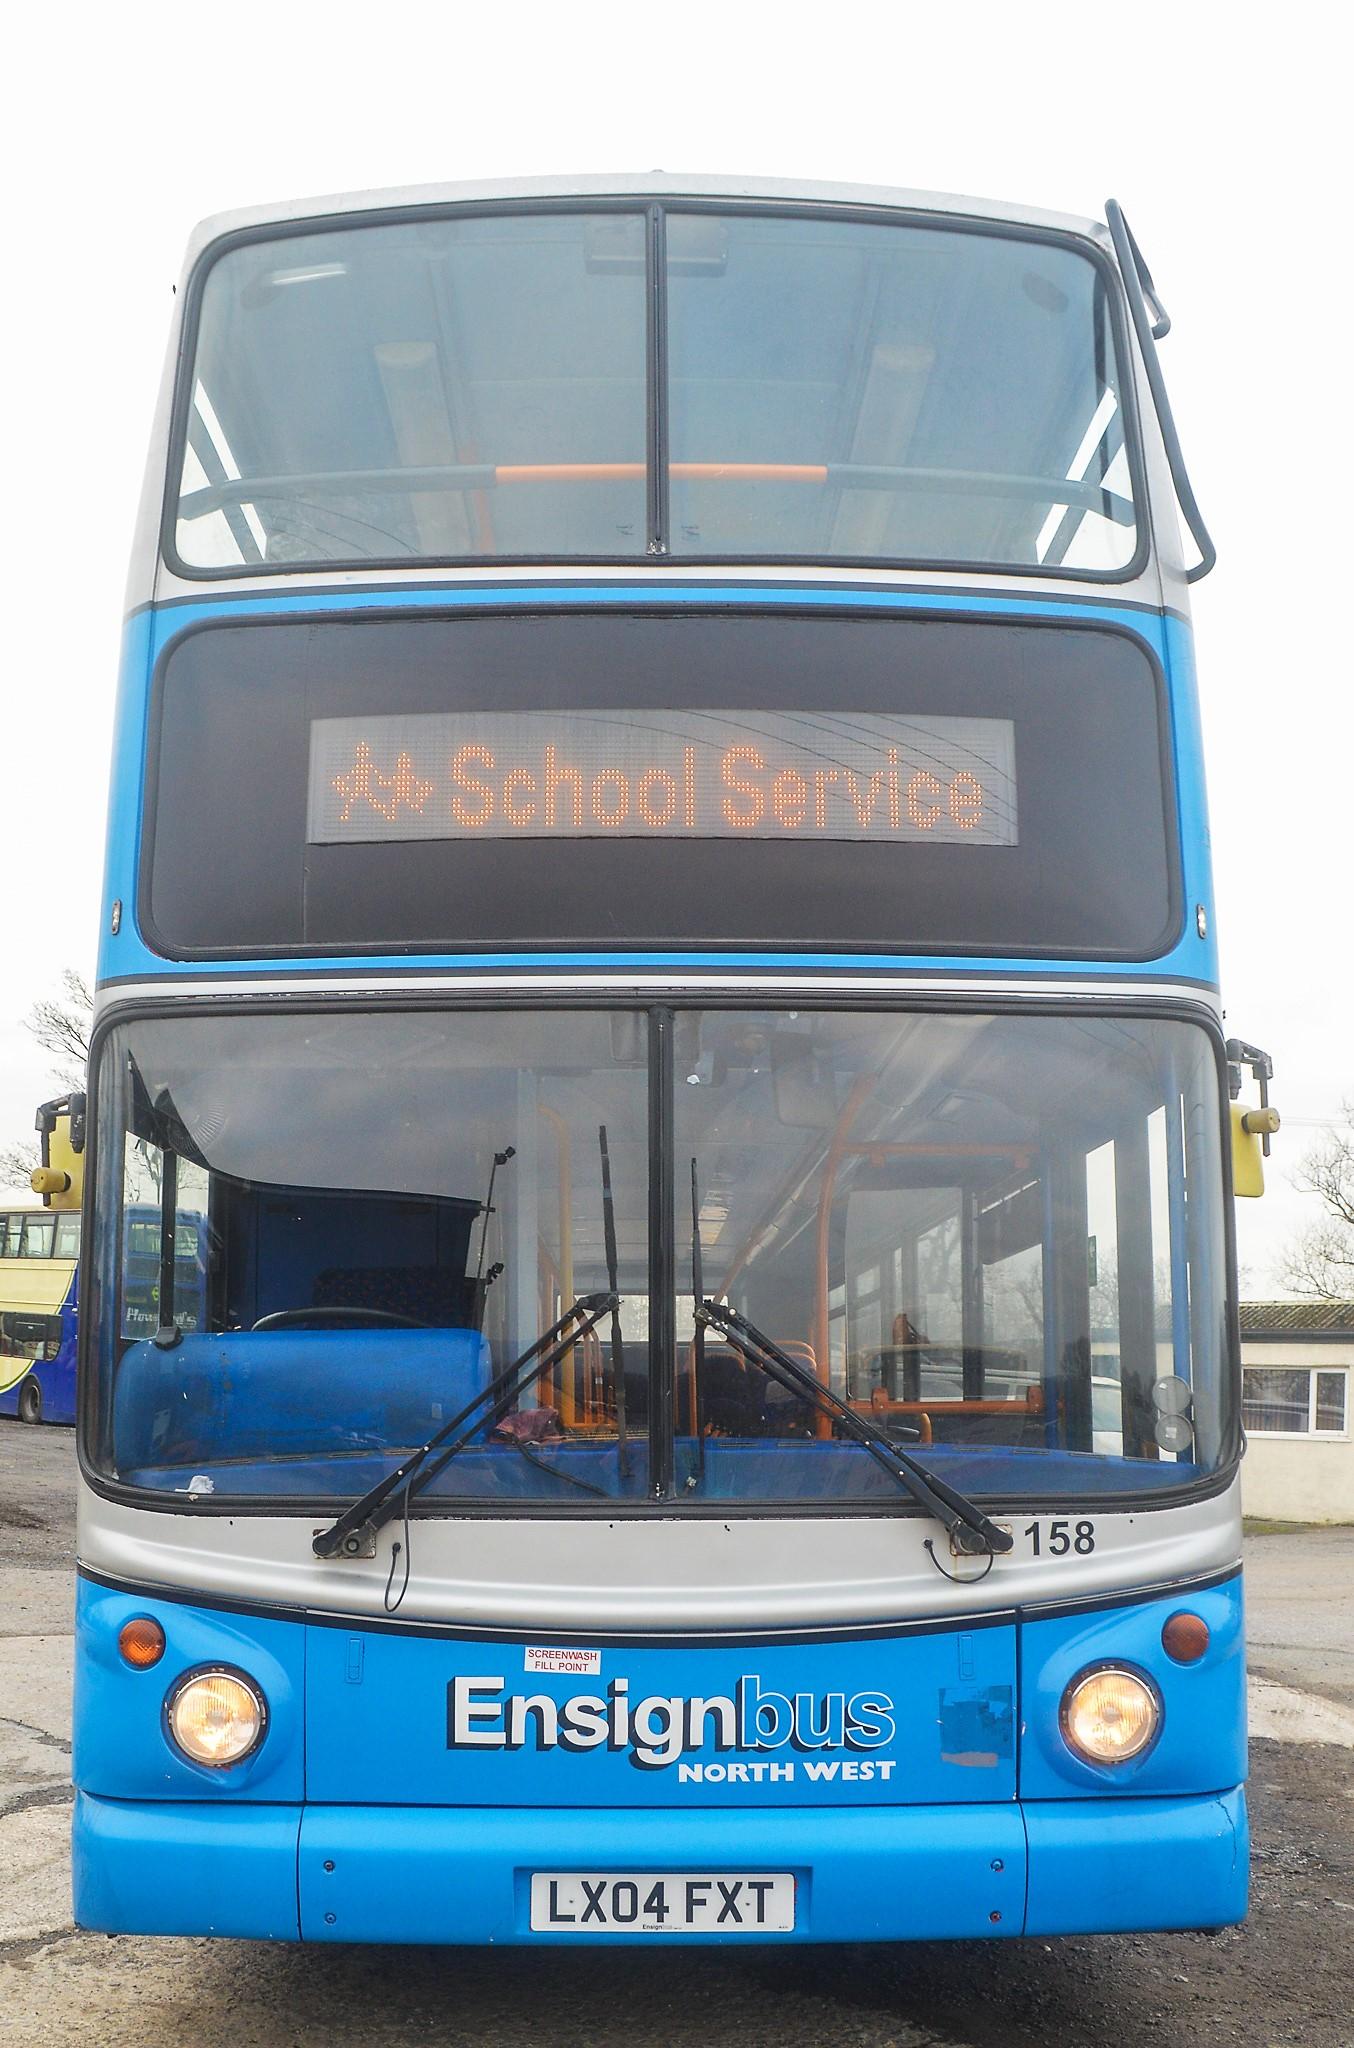 Lot 7 - Alexander Dennis Trident TransBus 80 seat double deck service bus Registration Number: LX04 FXT Date